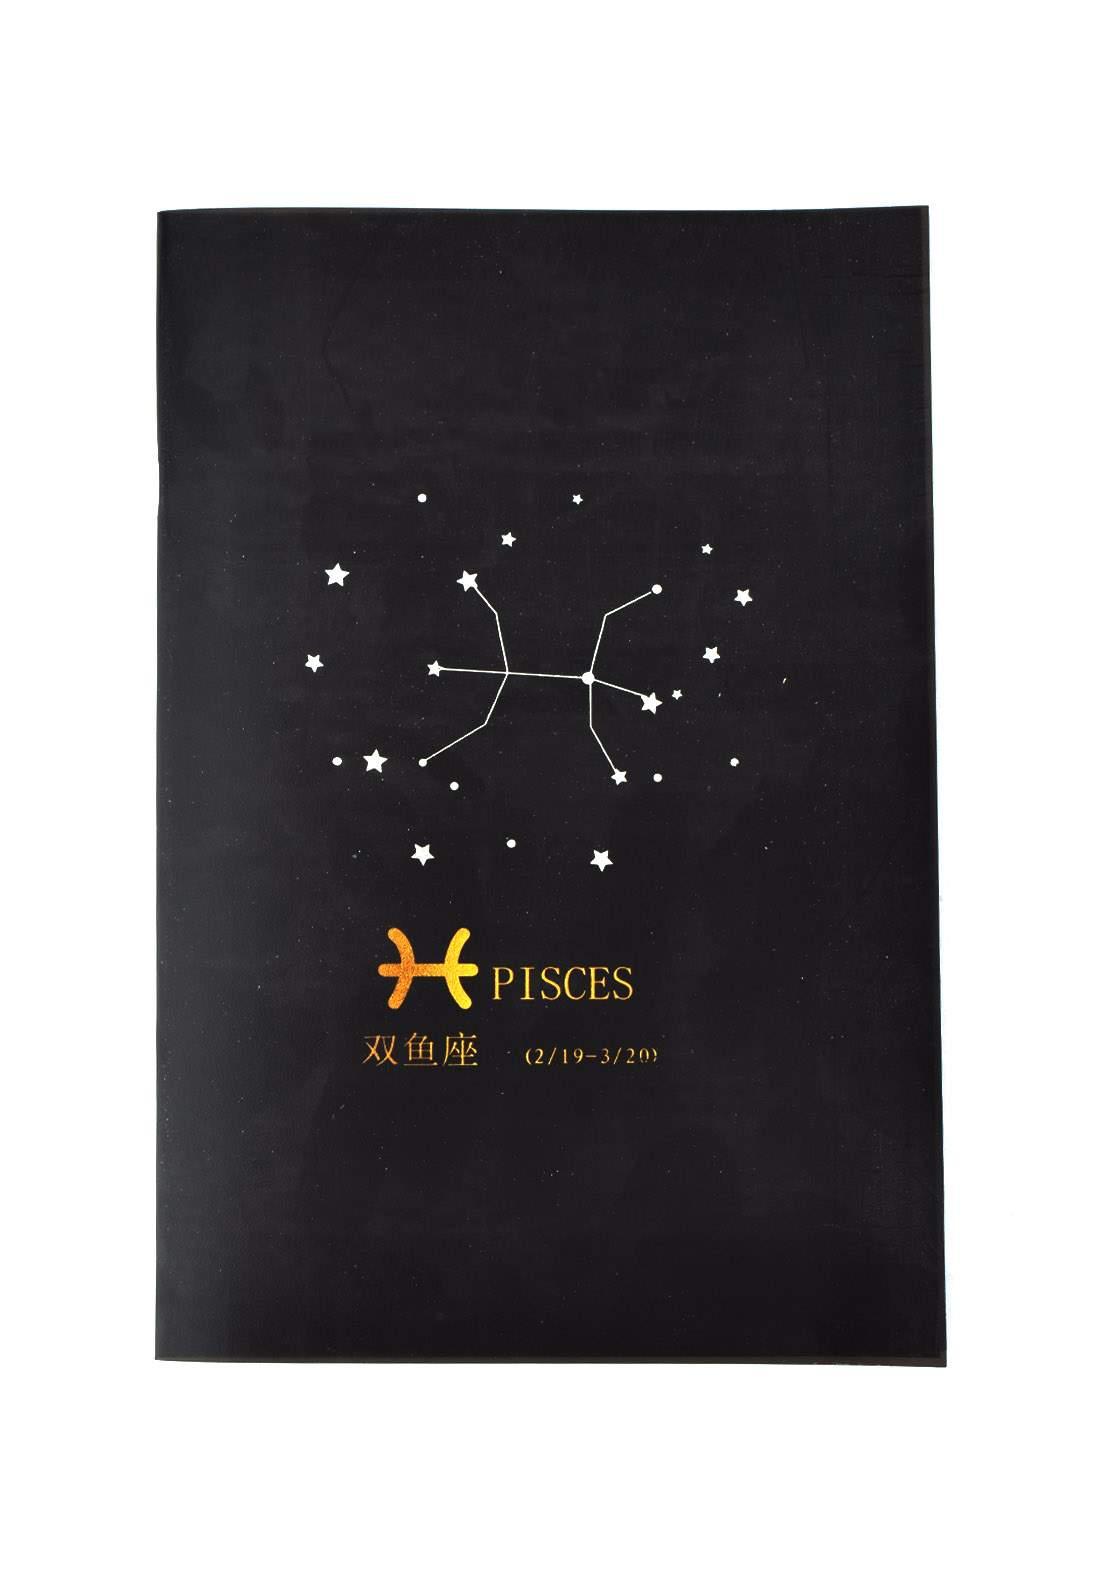 Small Black Drawing Book 24 Sheets-Pisces دفتر رسم اسود صغير بطبعة برج الحوت